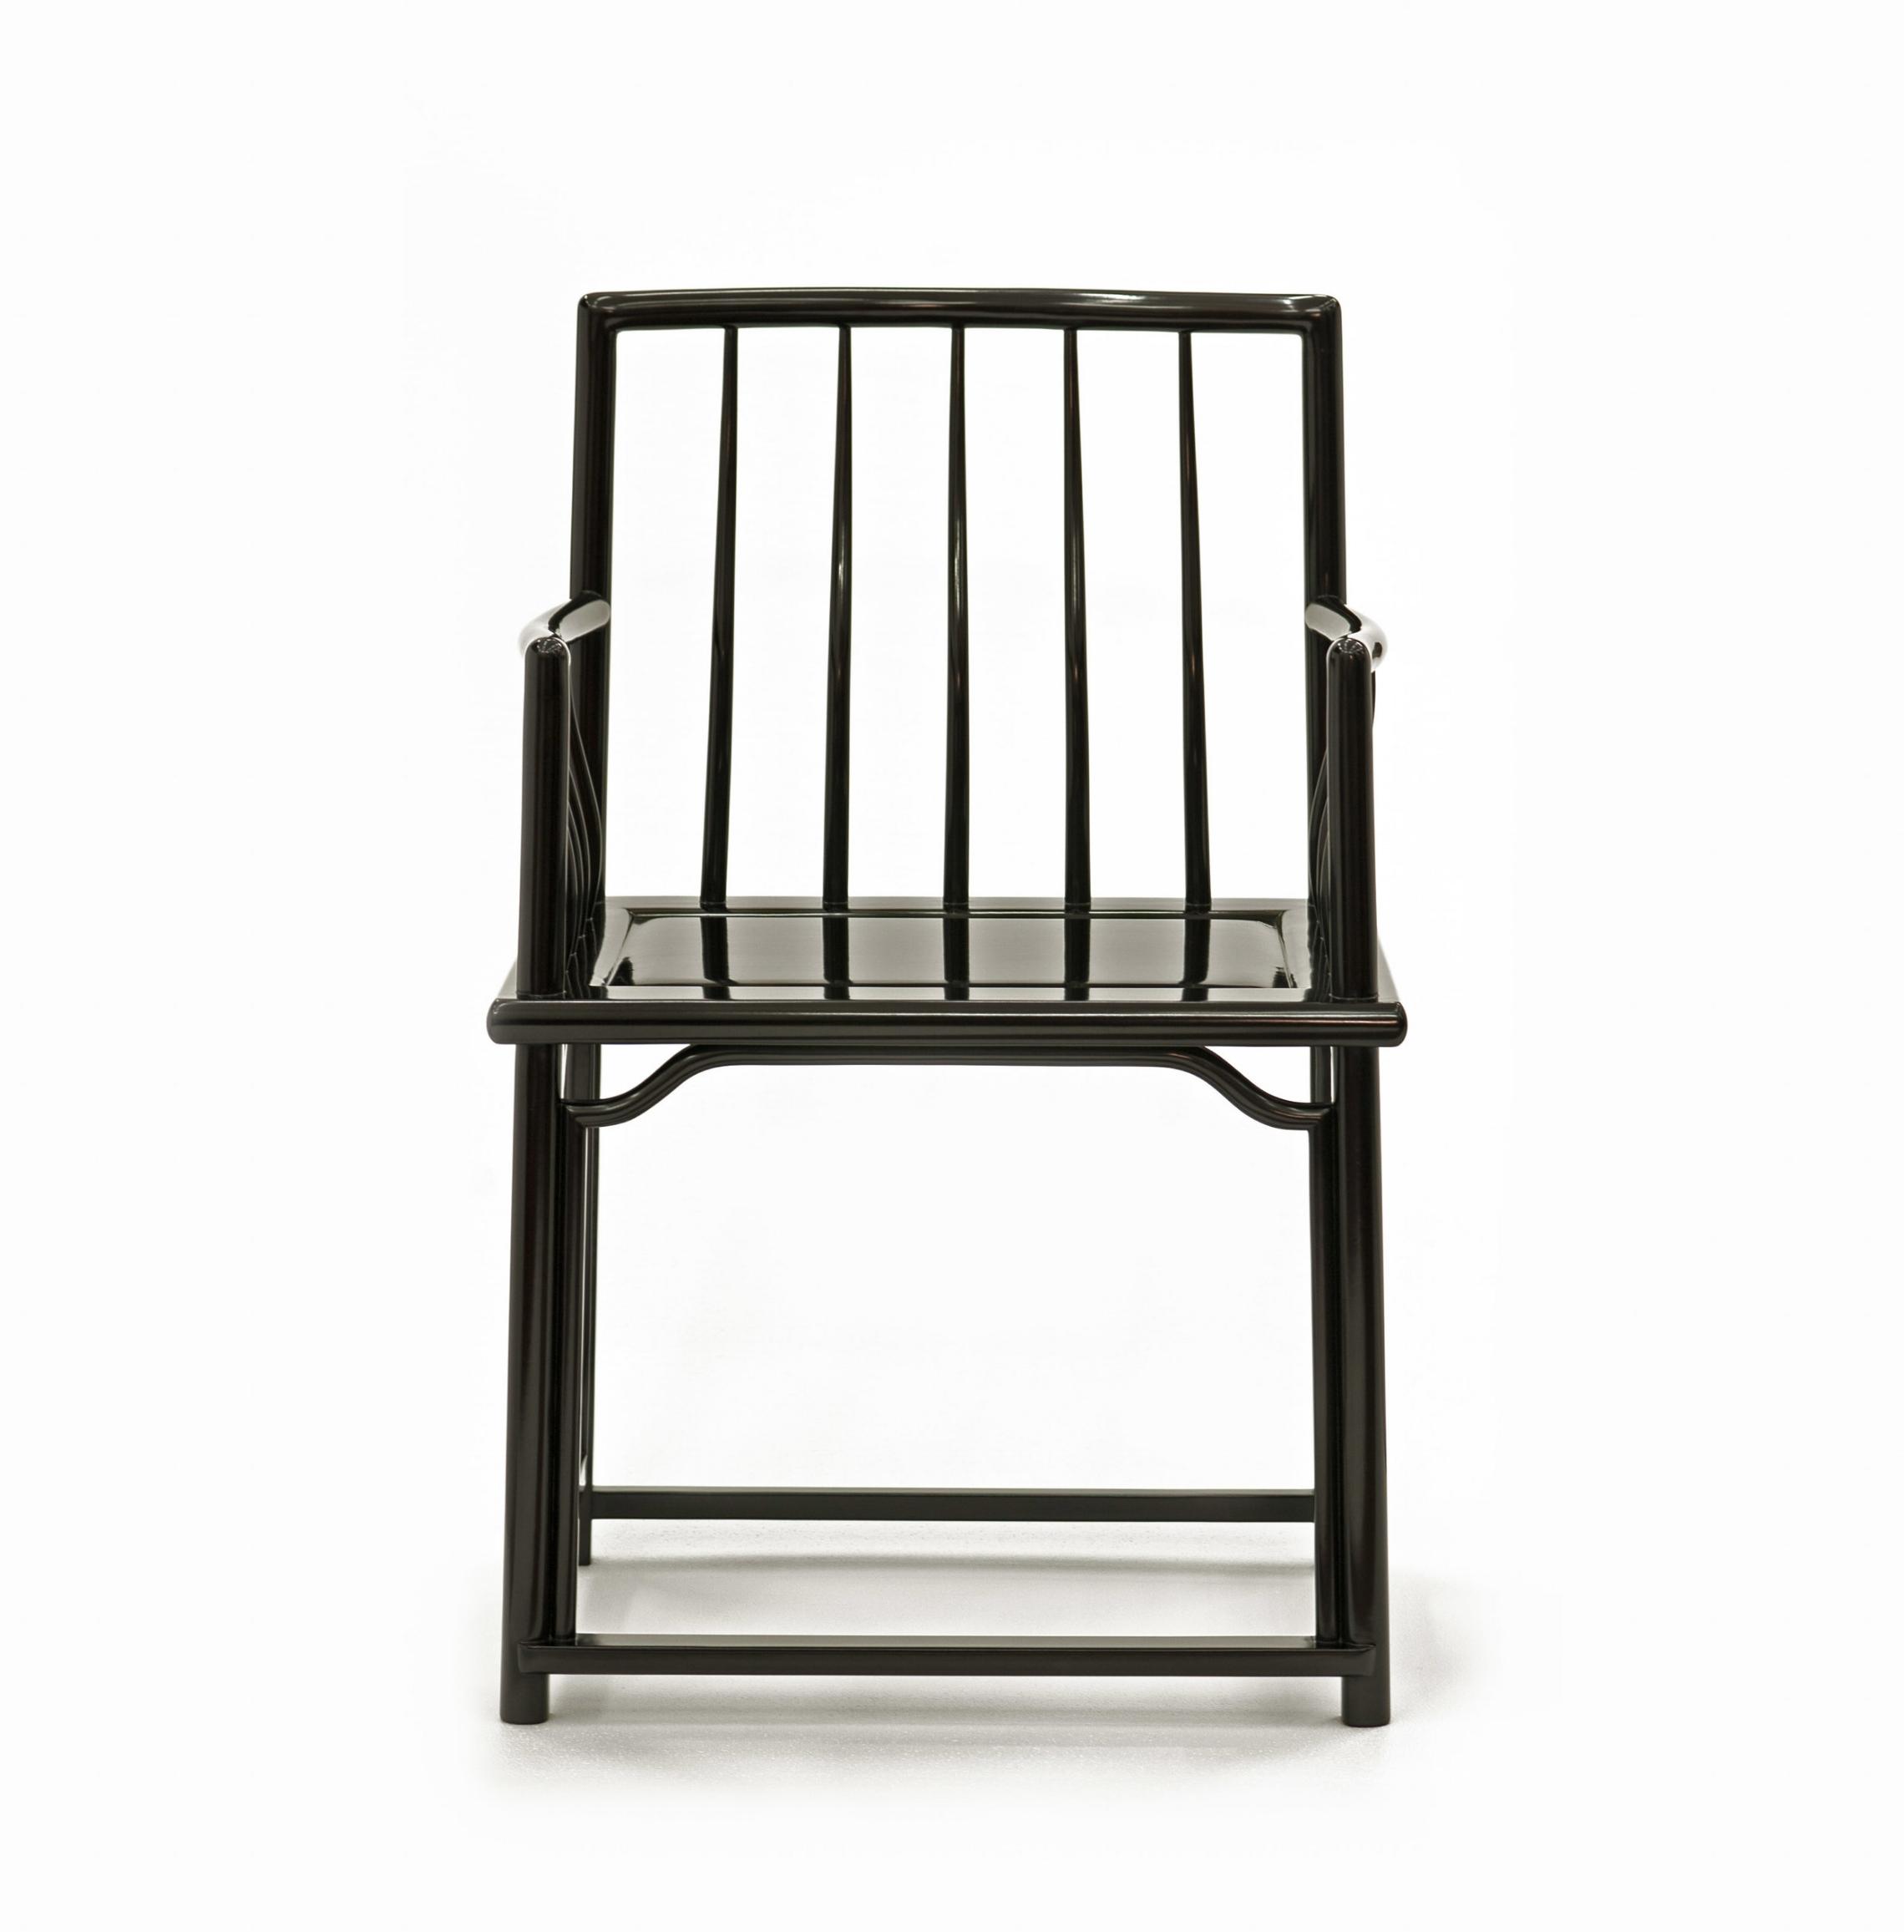 ....chinese ming style furniture : armchair..中式明式家具 : 扶手椅....